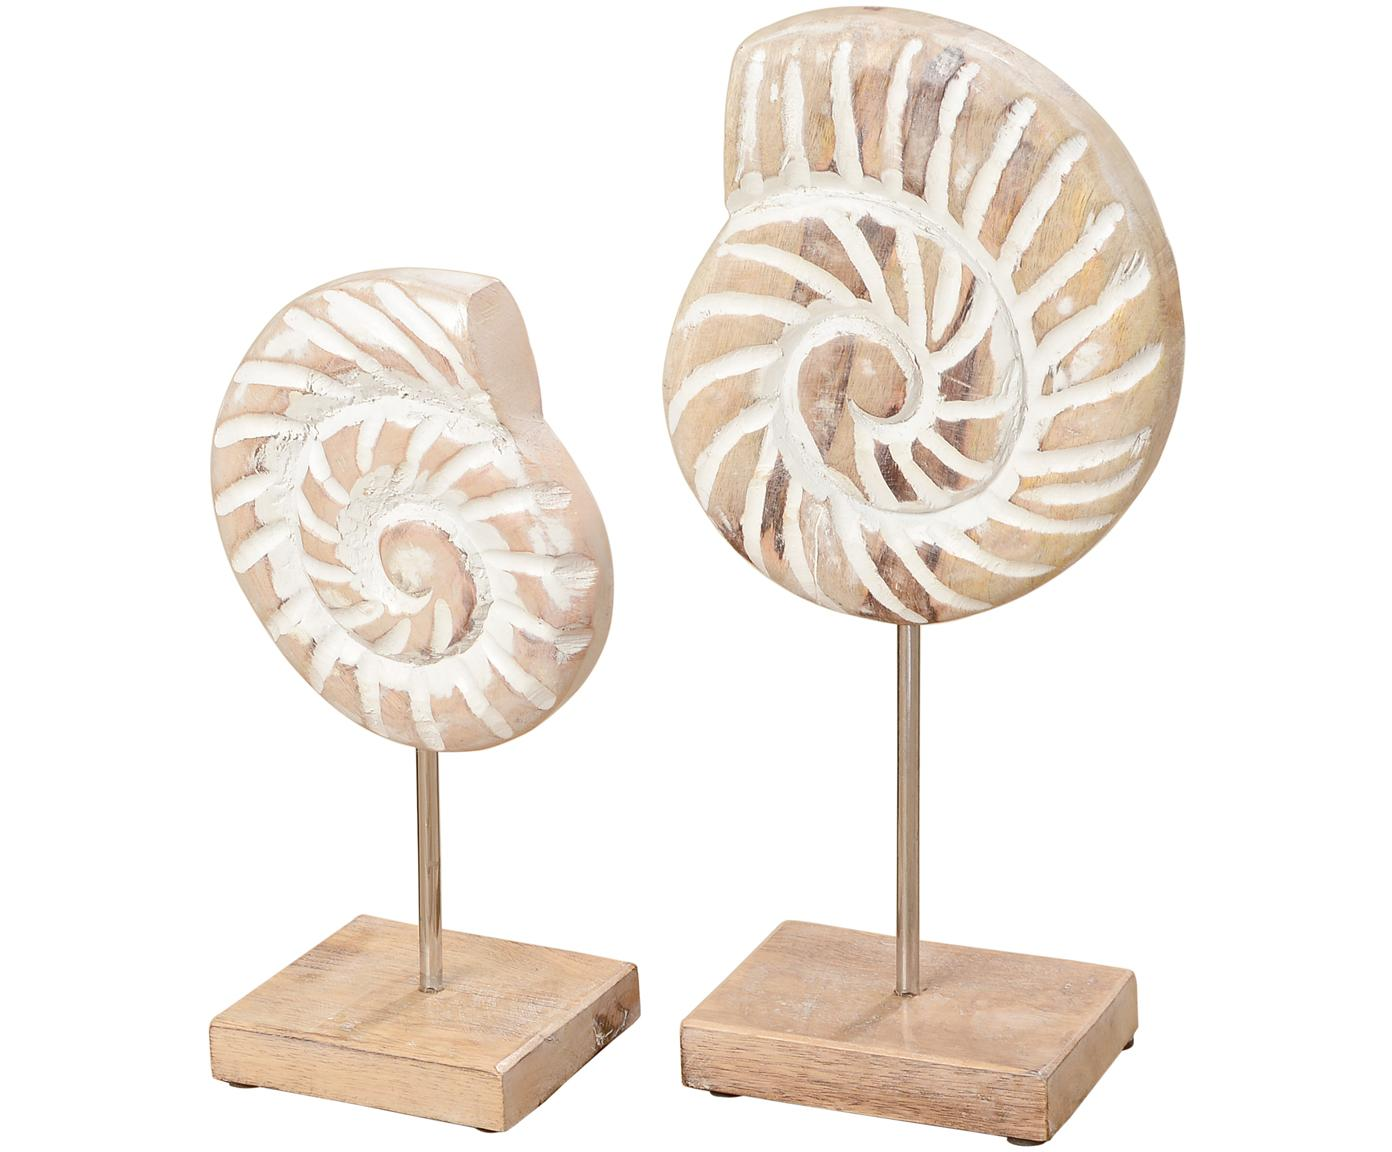 Set conchiglie decorative Ana, 2 pz., Legno di mango, metallo, Legno di mango, bianco, Diverse dimensioni